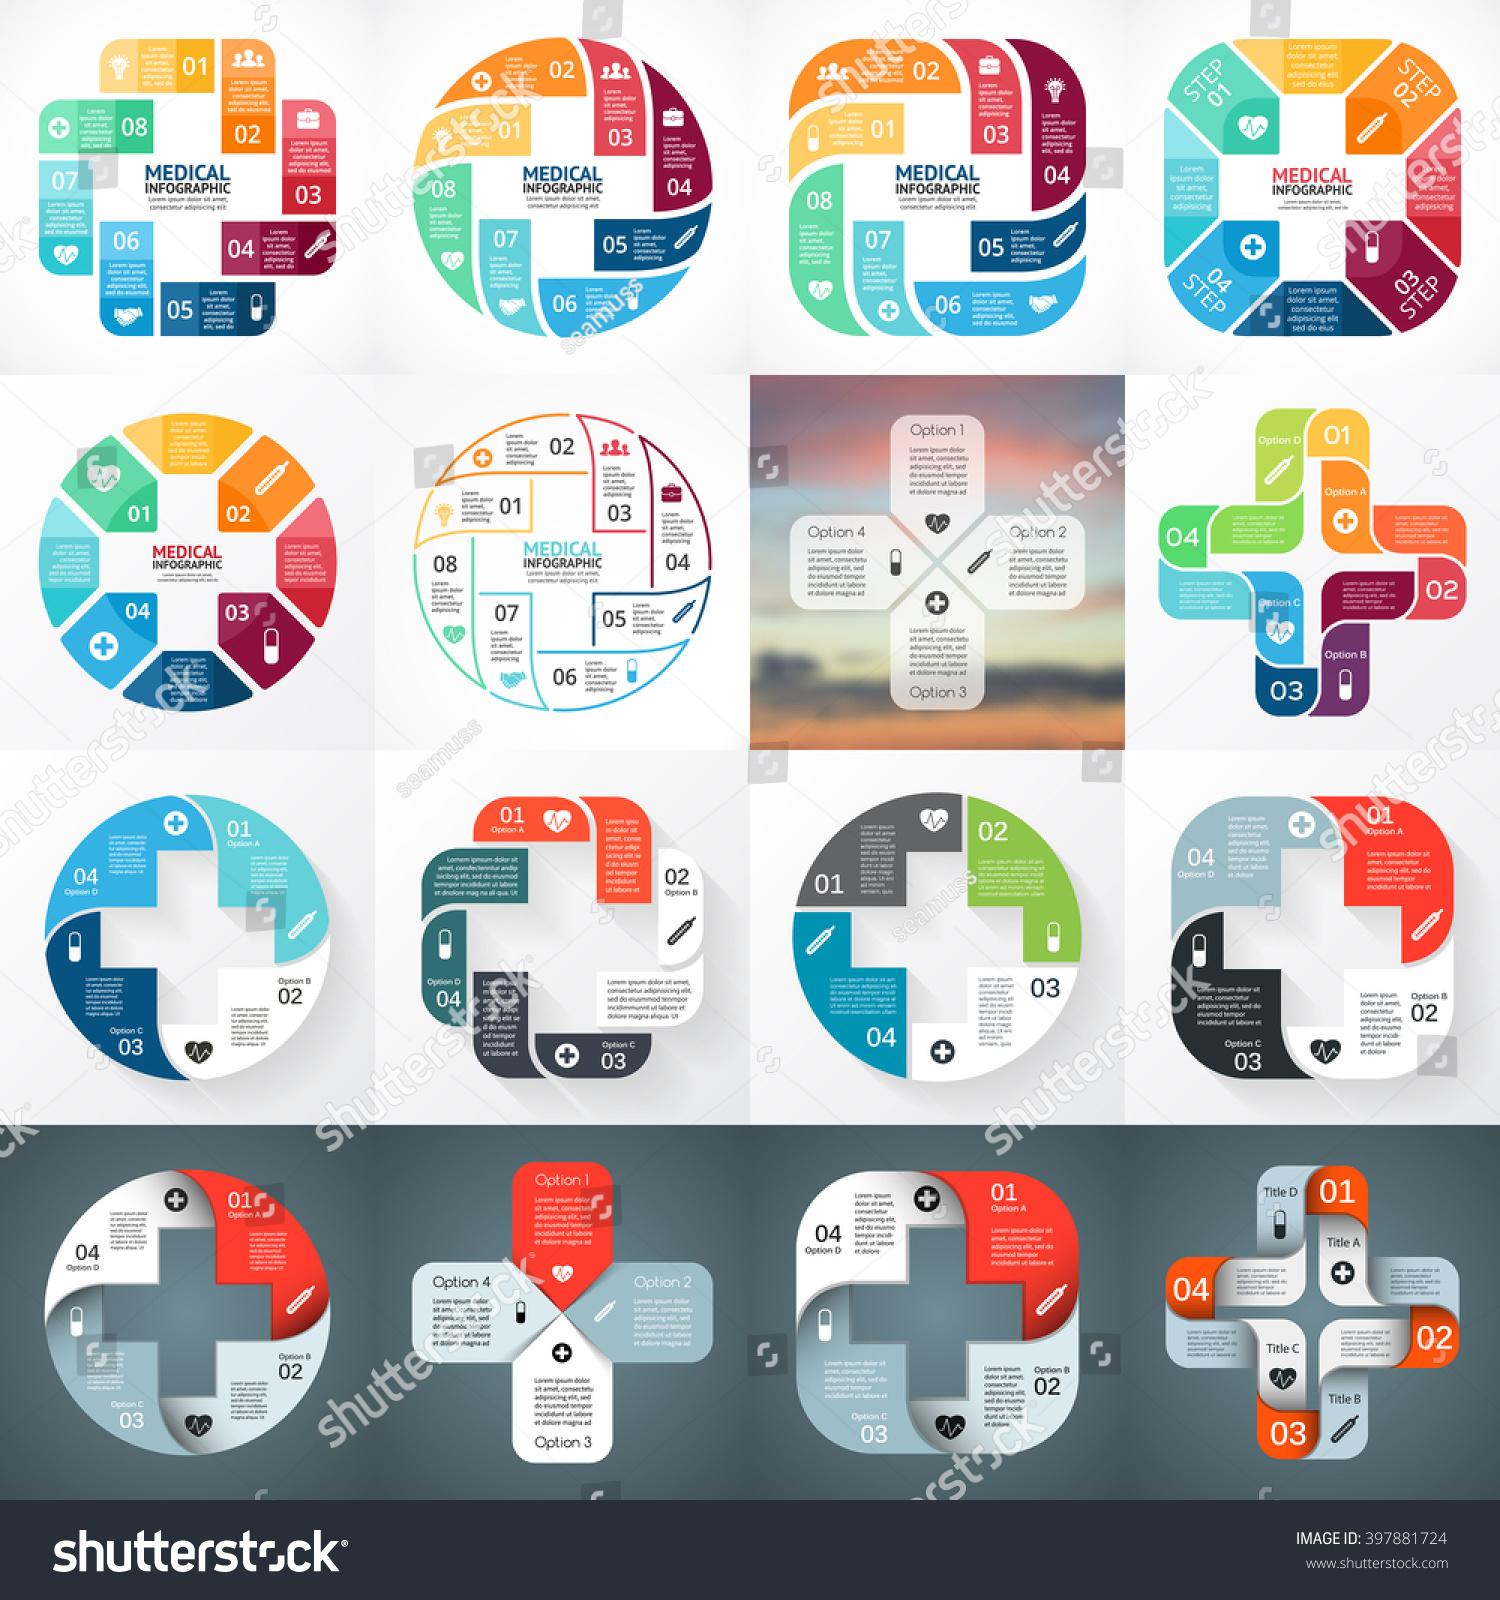 vector plus infographic medical diagram healthcare stock vector